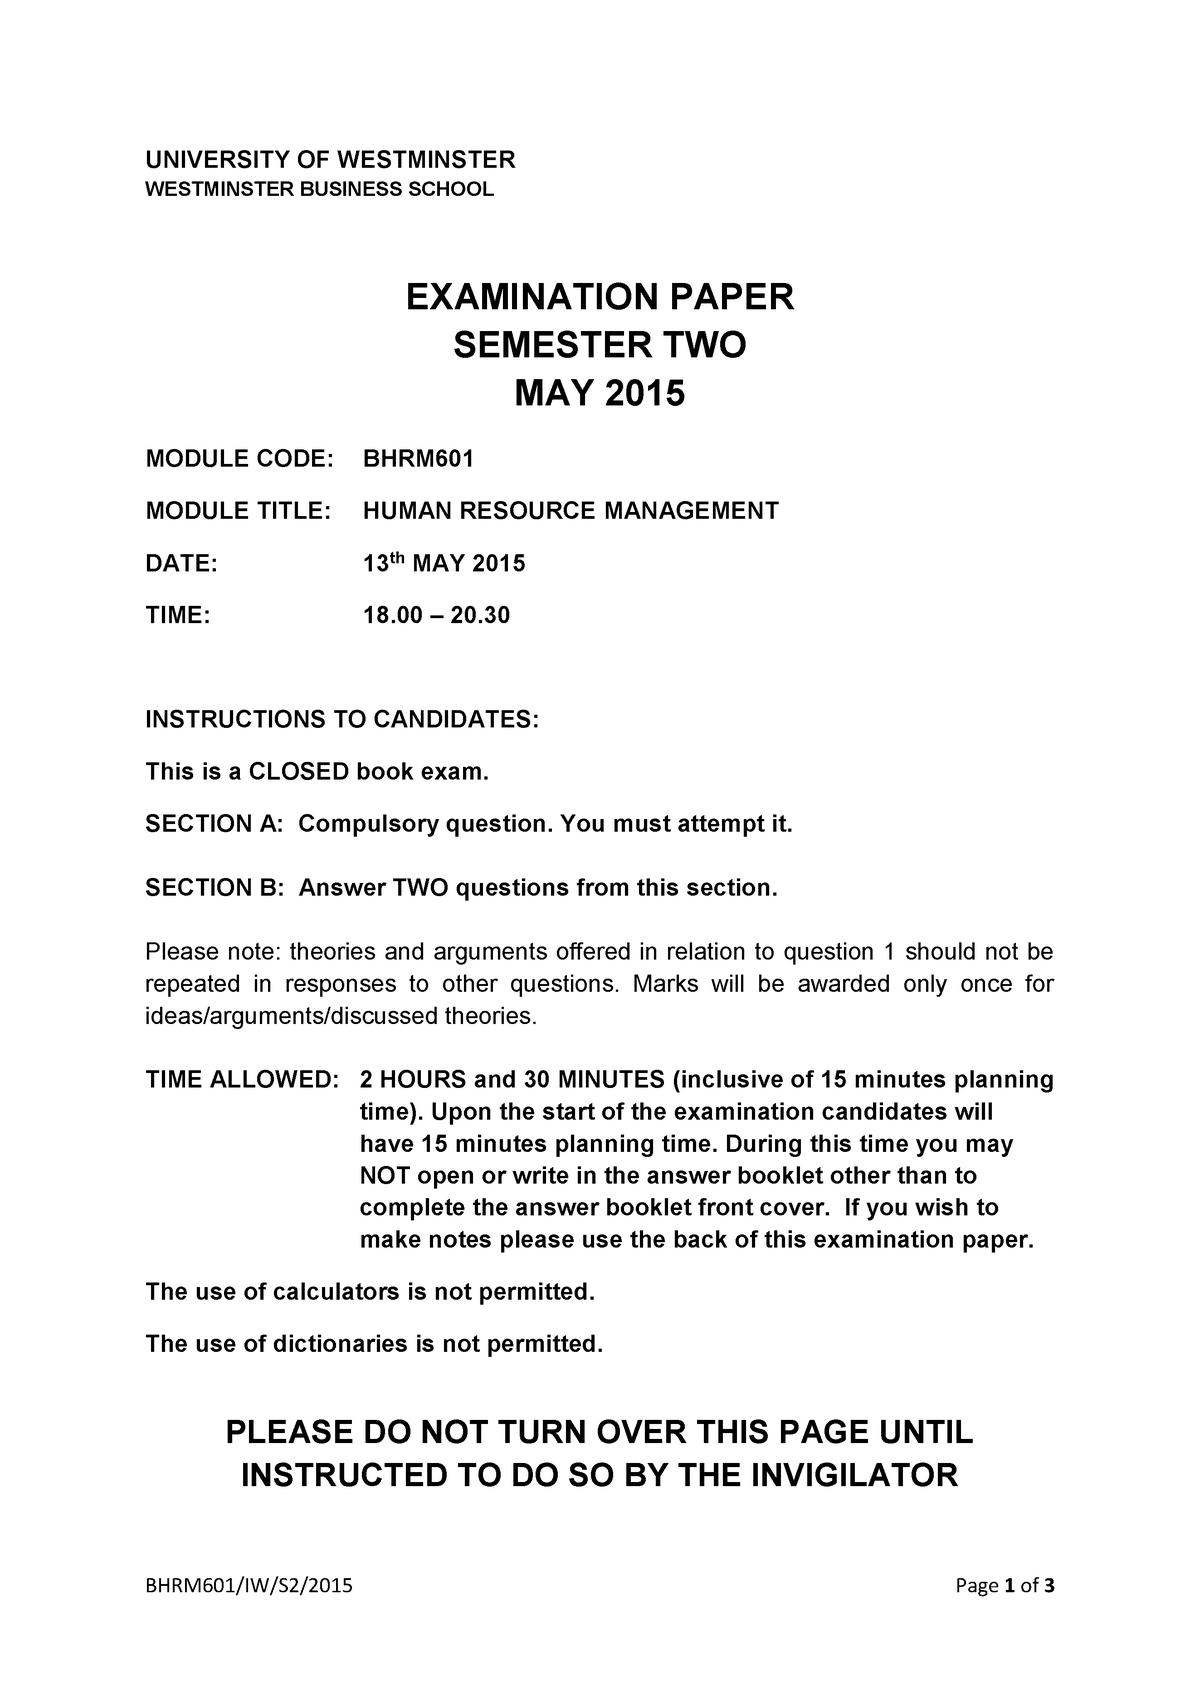 Exam 2015 - BMAM702: Human Resource Management - StuDocu